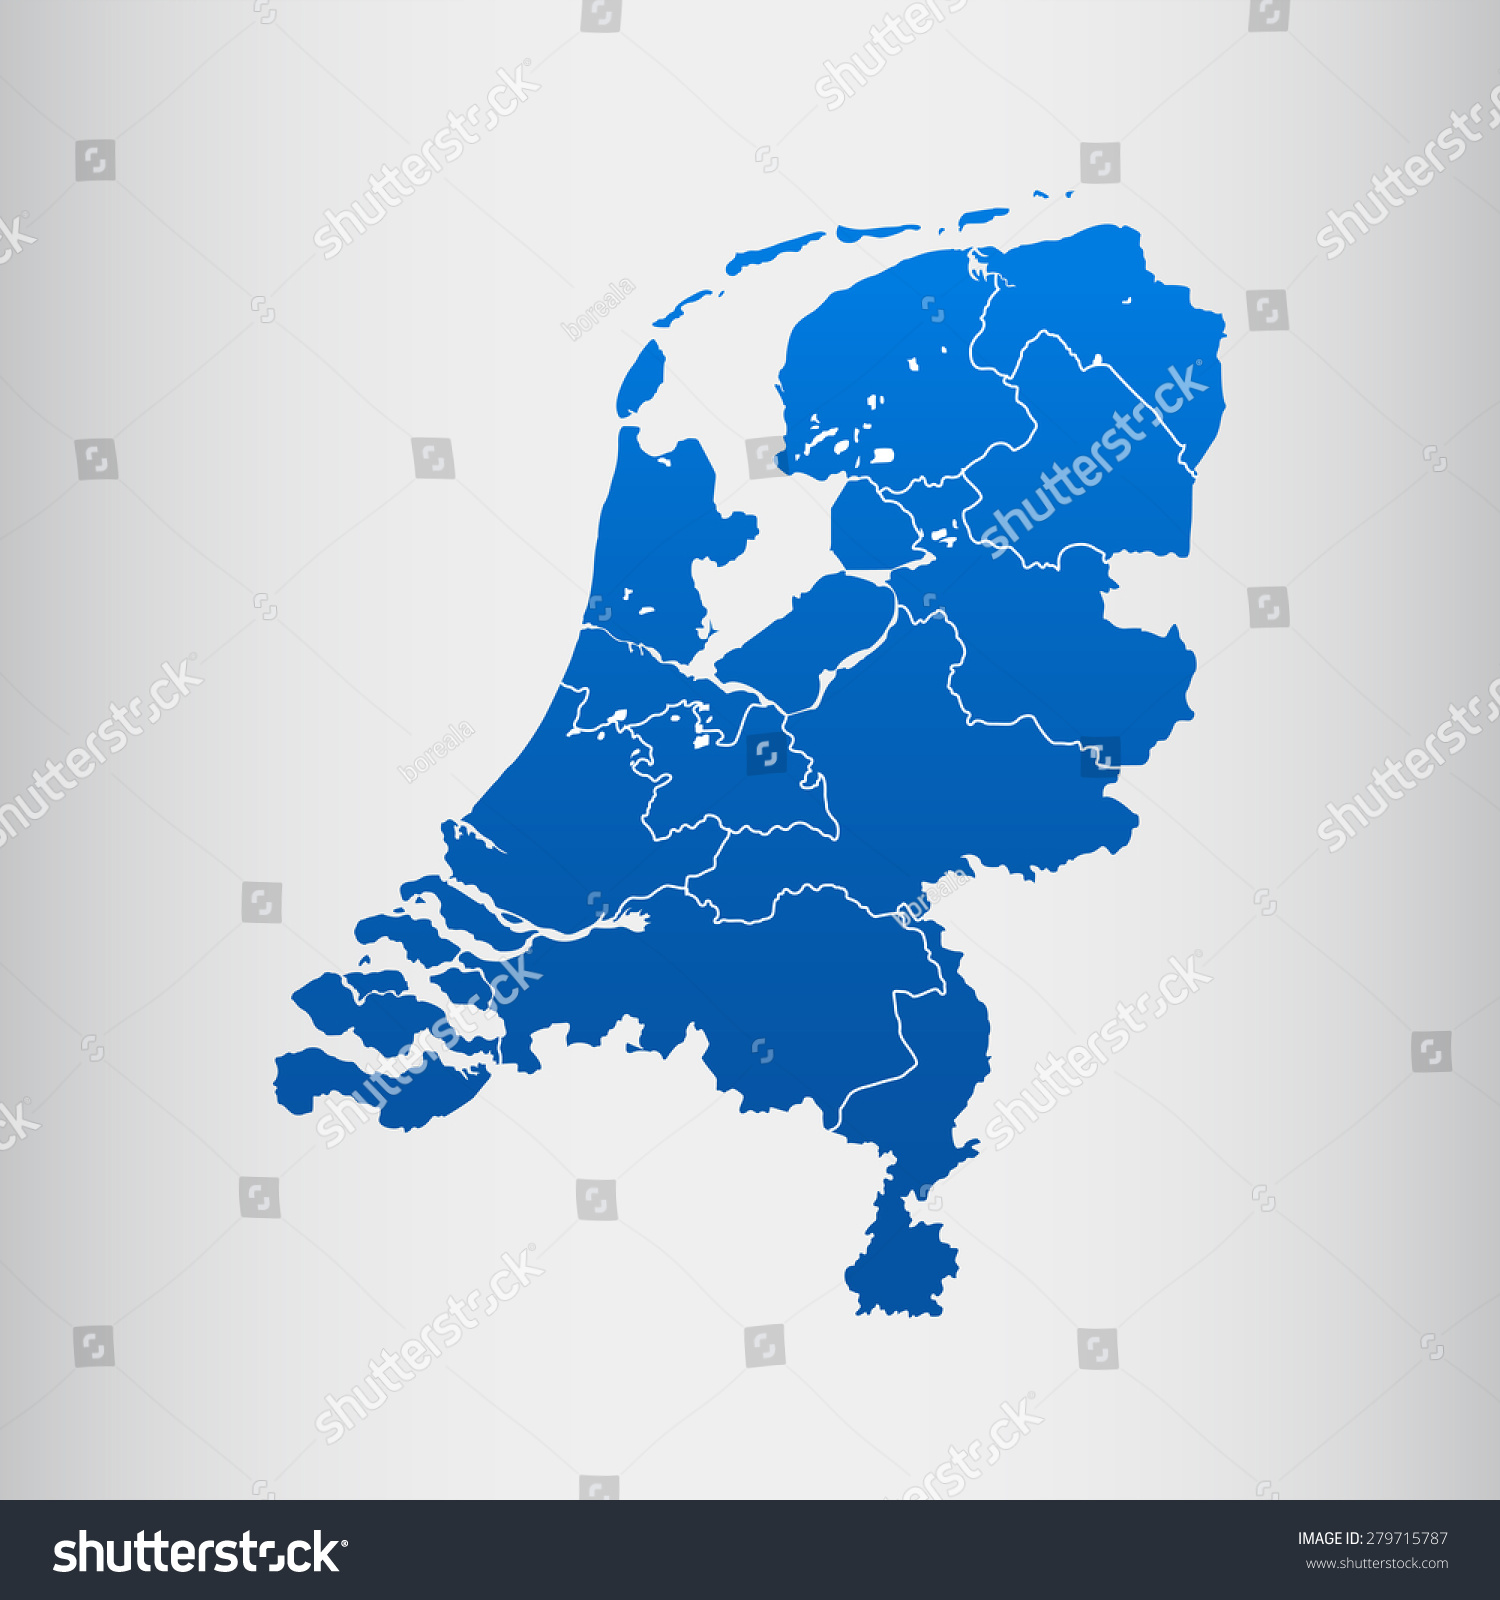 Map Of Netherlands Stock Vector Illustration 279715787